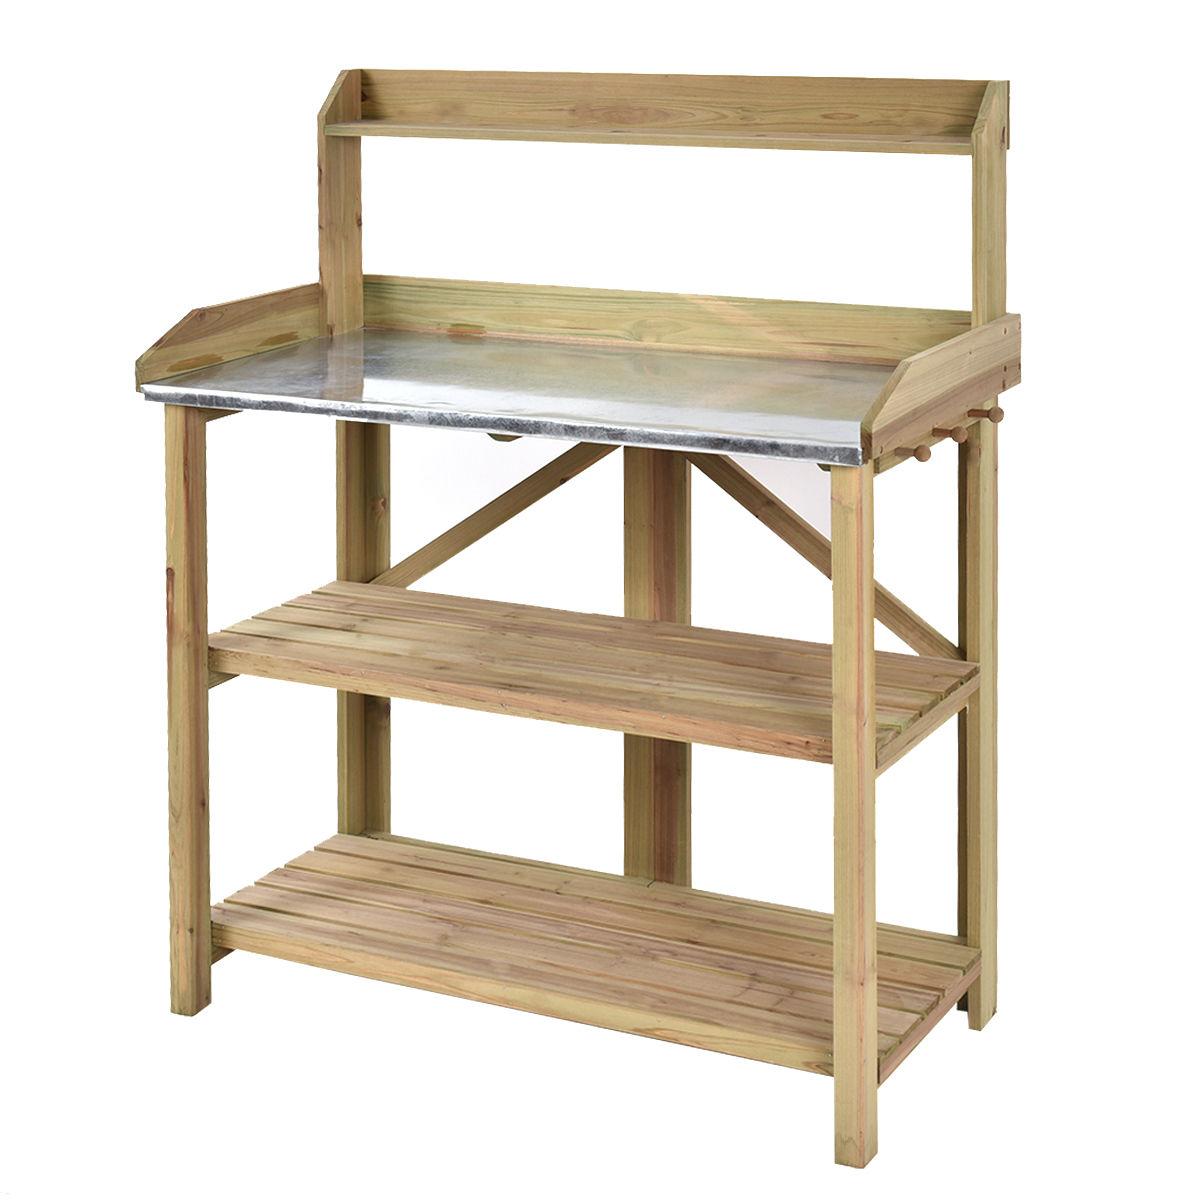 "GHP Outdoor 41.3""Lx19.3""Wx47.8""H Solid Fir Wooden Garden Potting Bench/Workstation"